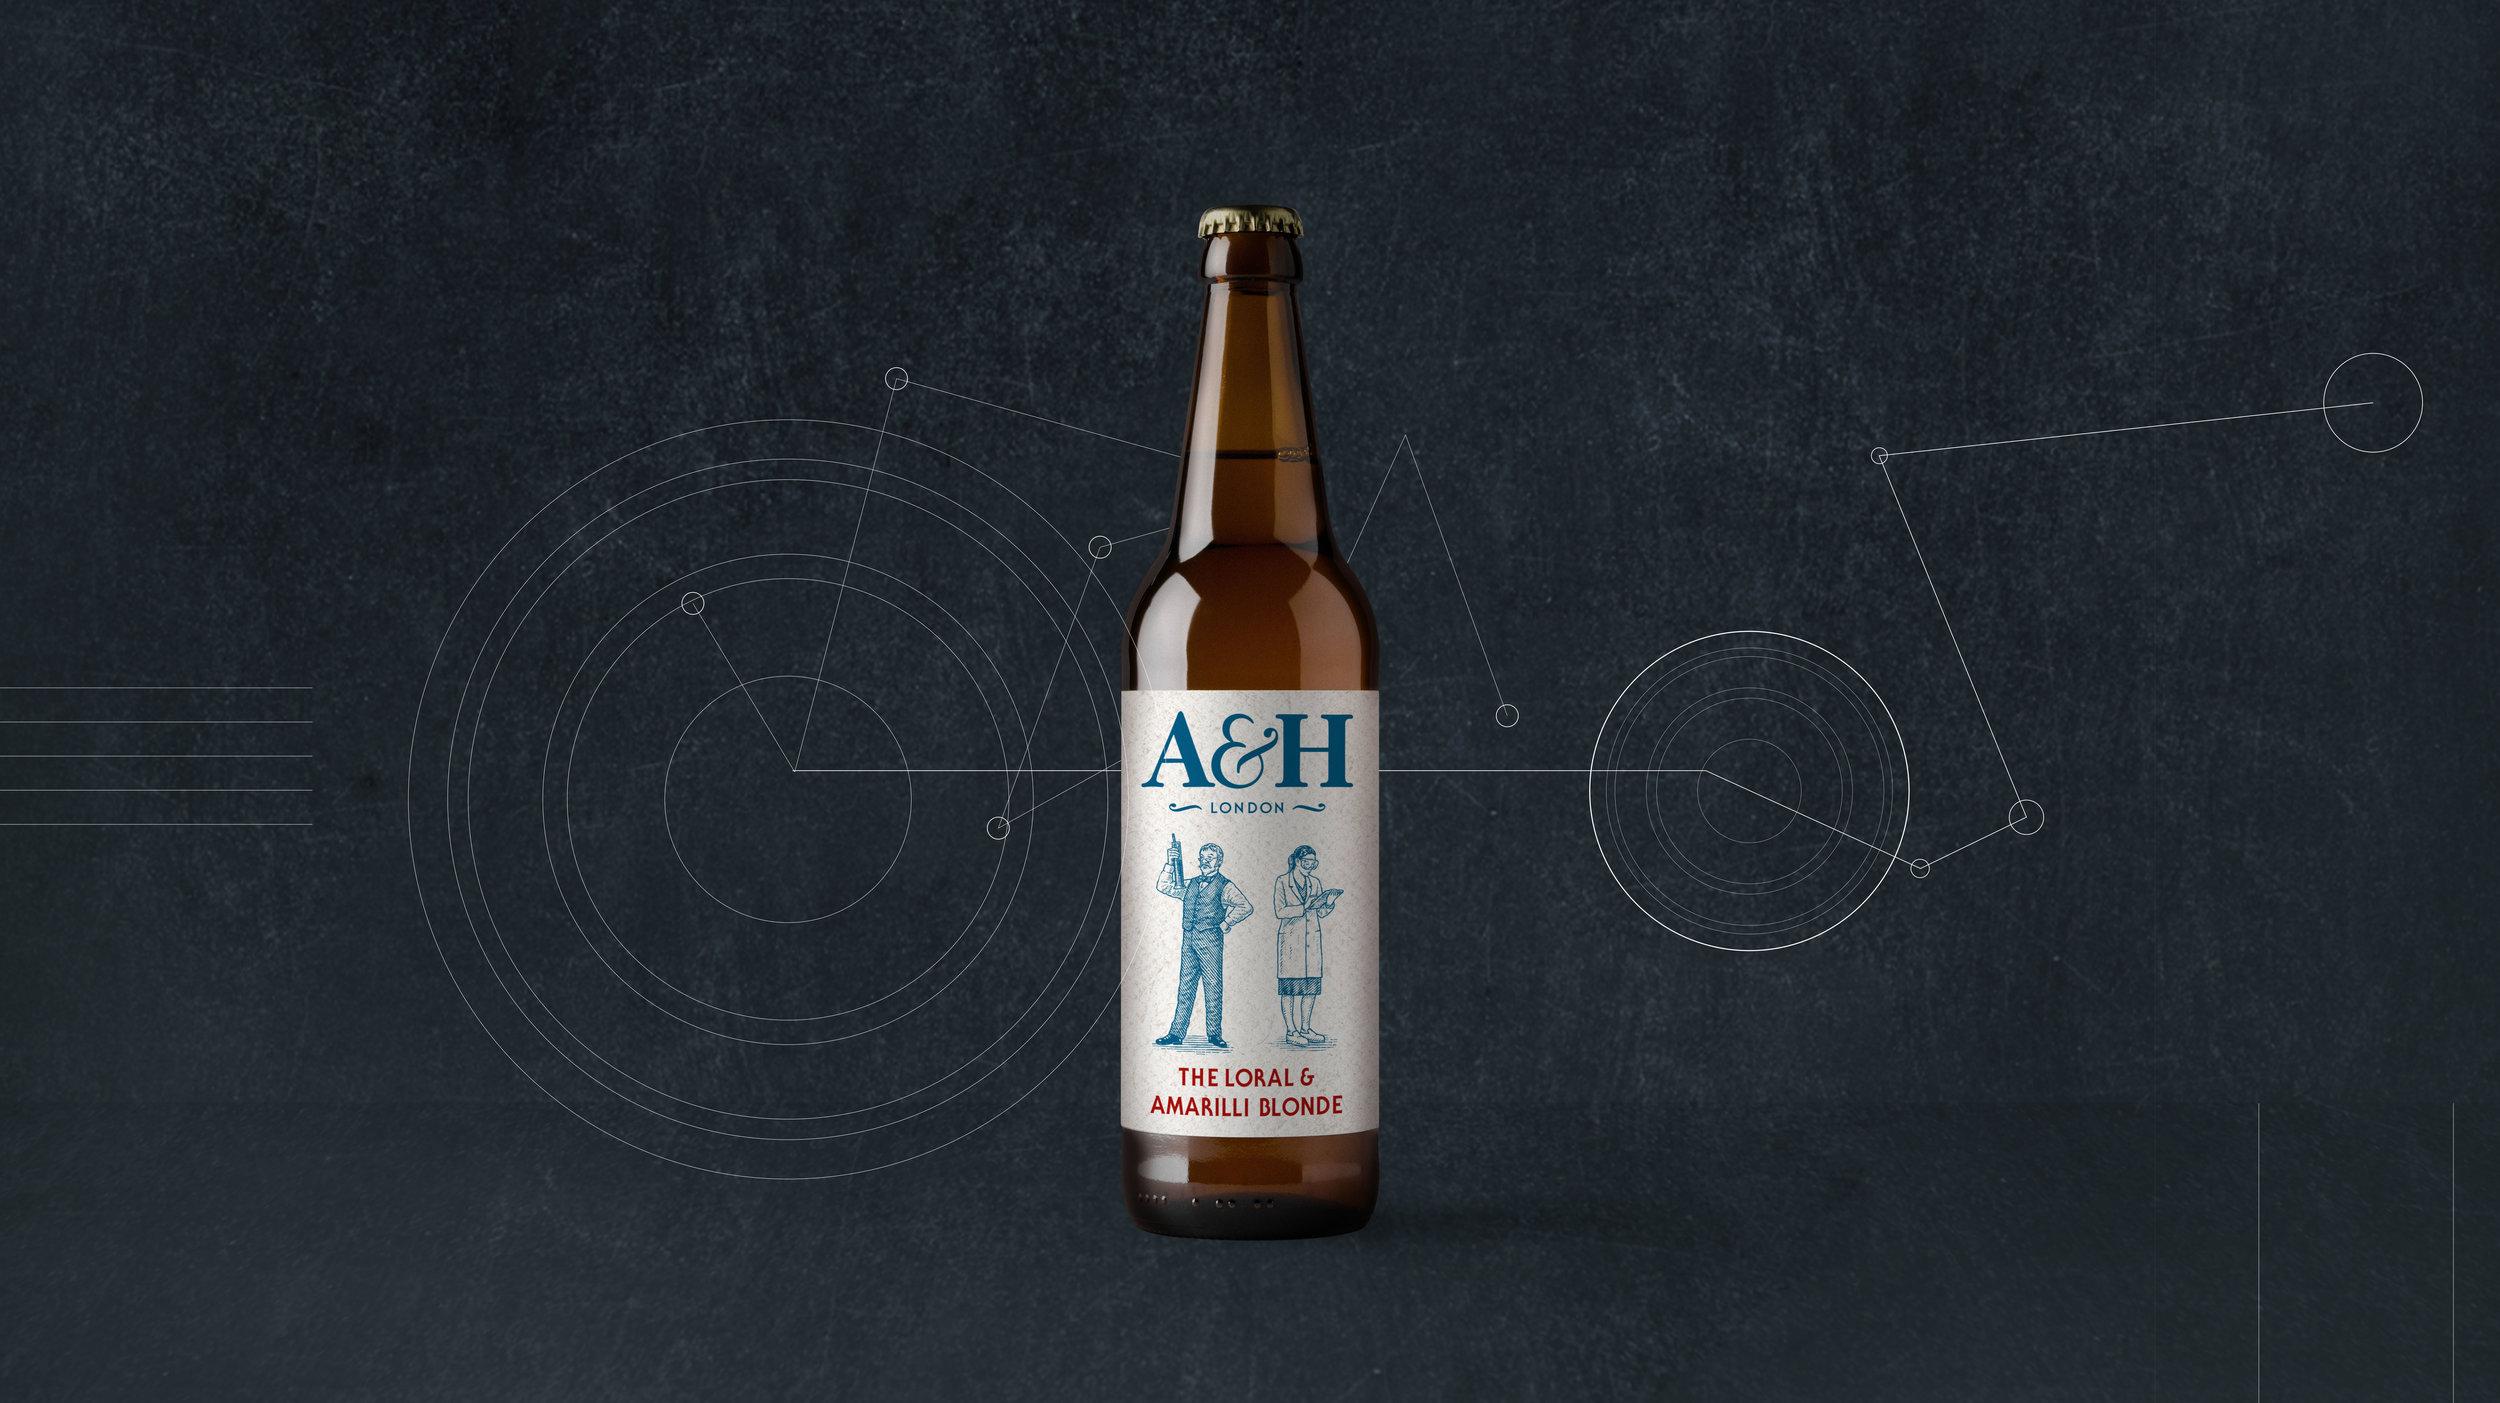 A&H_Bottle_Centred_ExperimentalRange_Loral&Amarillo.jpg